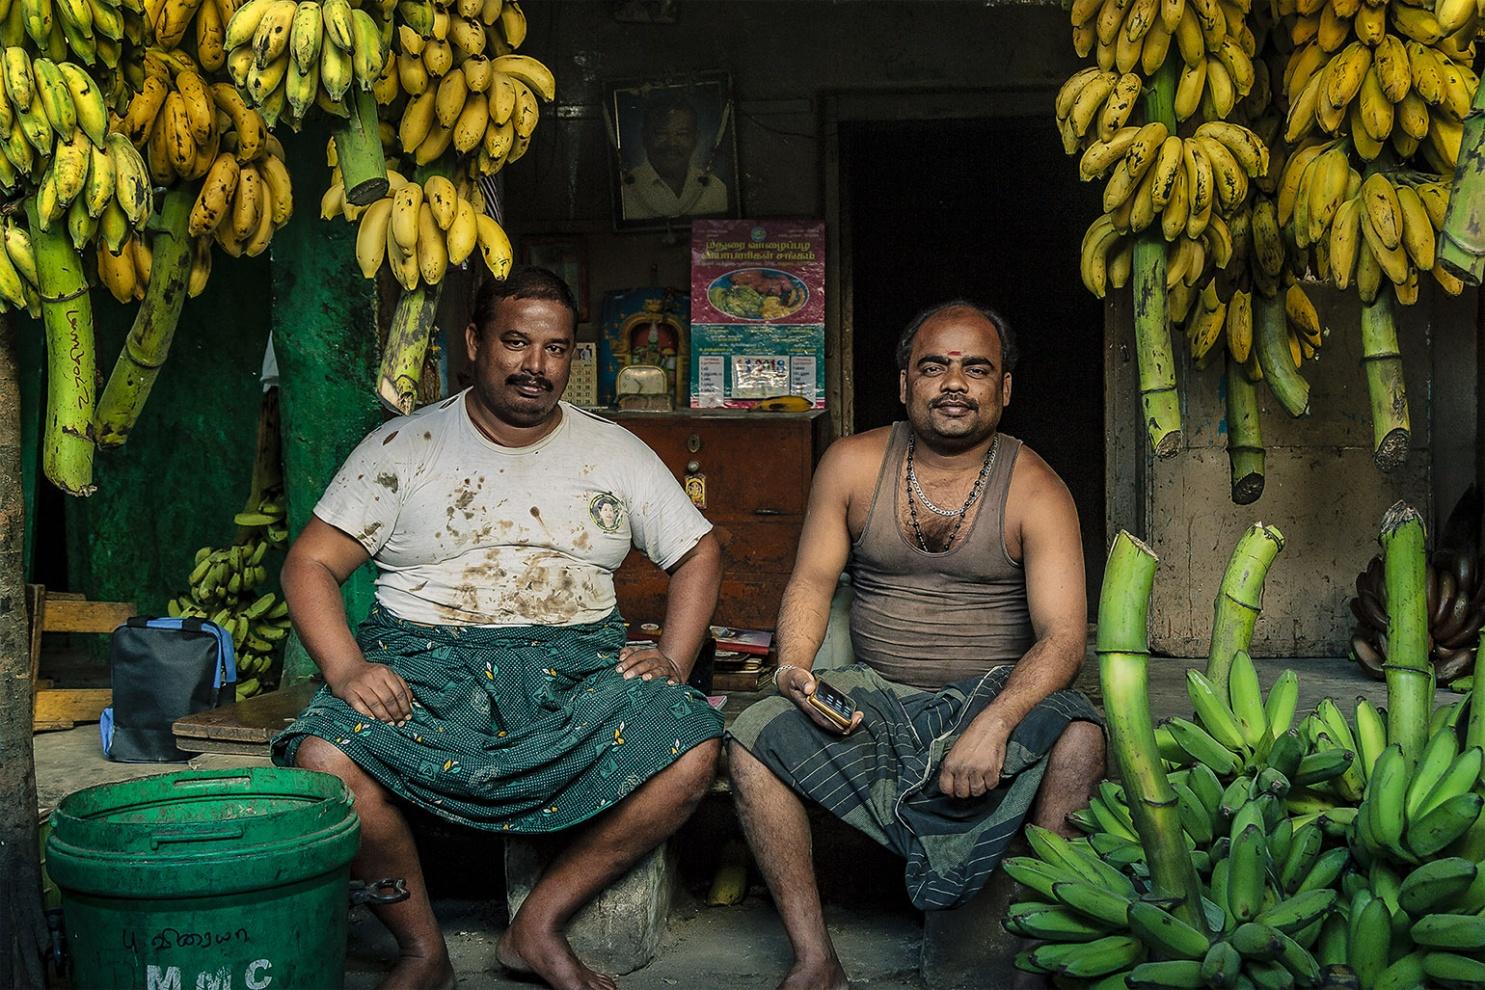 Banana men Madurai fruit market, Tamil Nadu 2012 digital photography